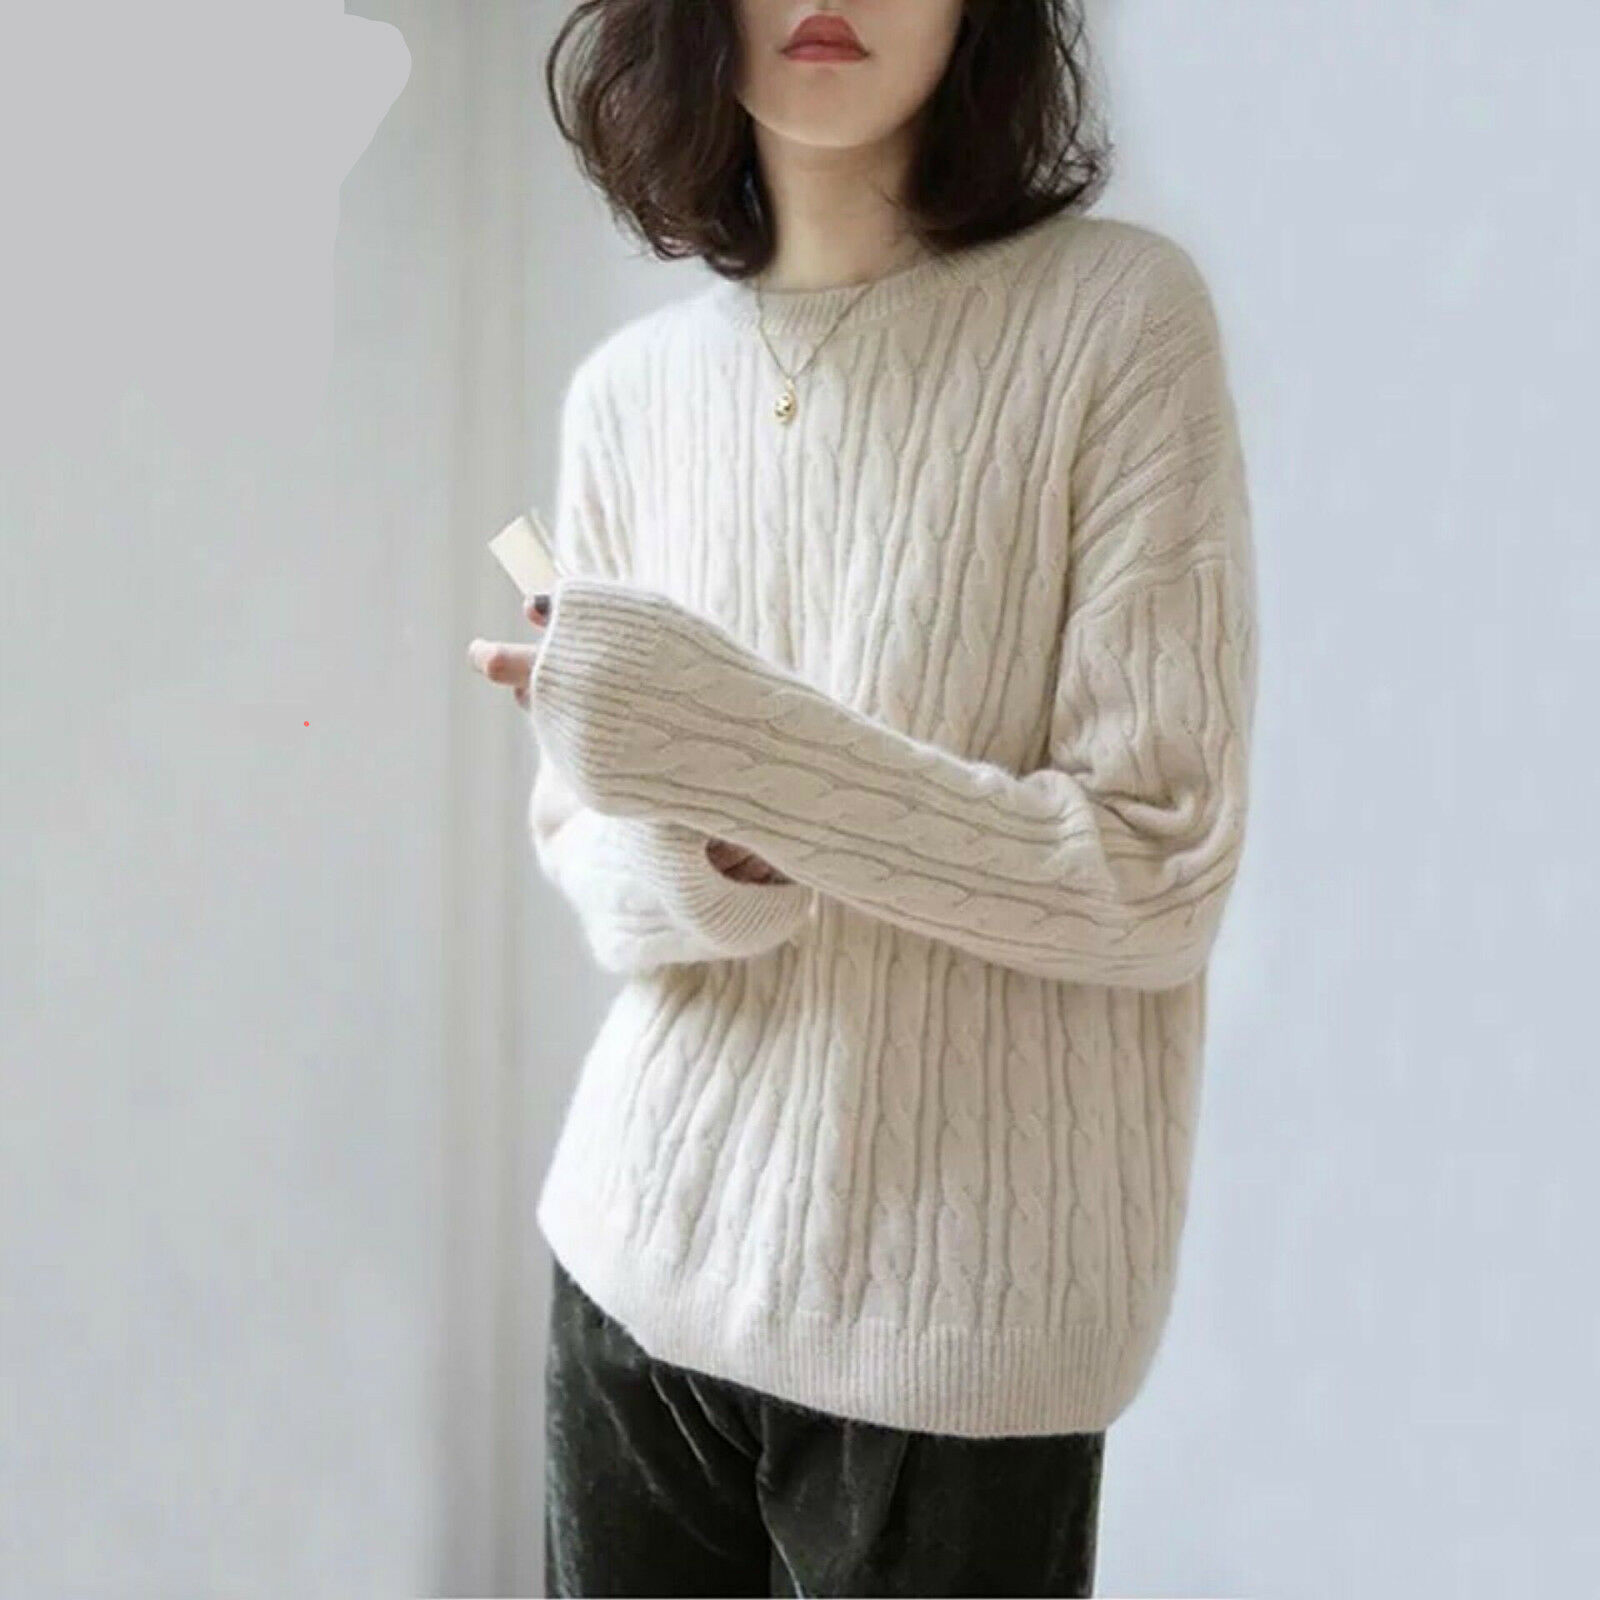 hot sale online 6ad0b 3416c Dicke Pullover Damen Vergleich Test +++ Dicke Pullover Damen ...